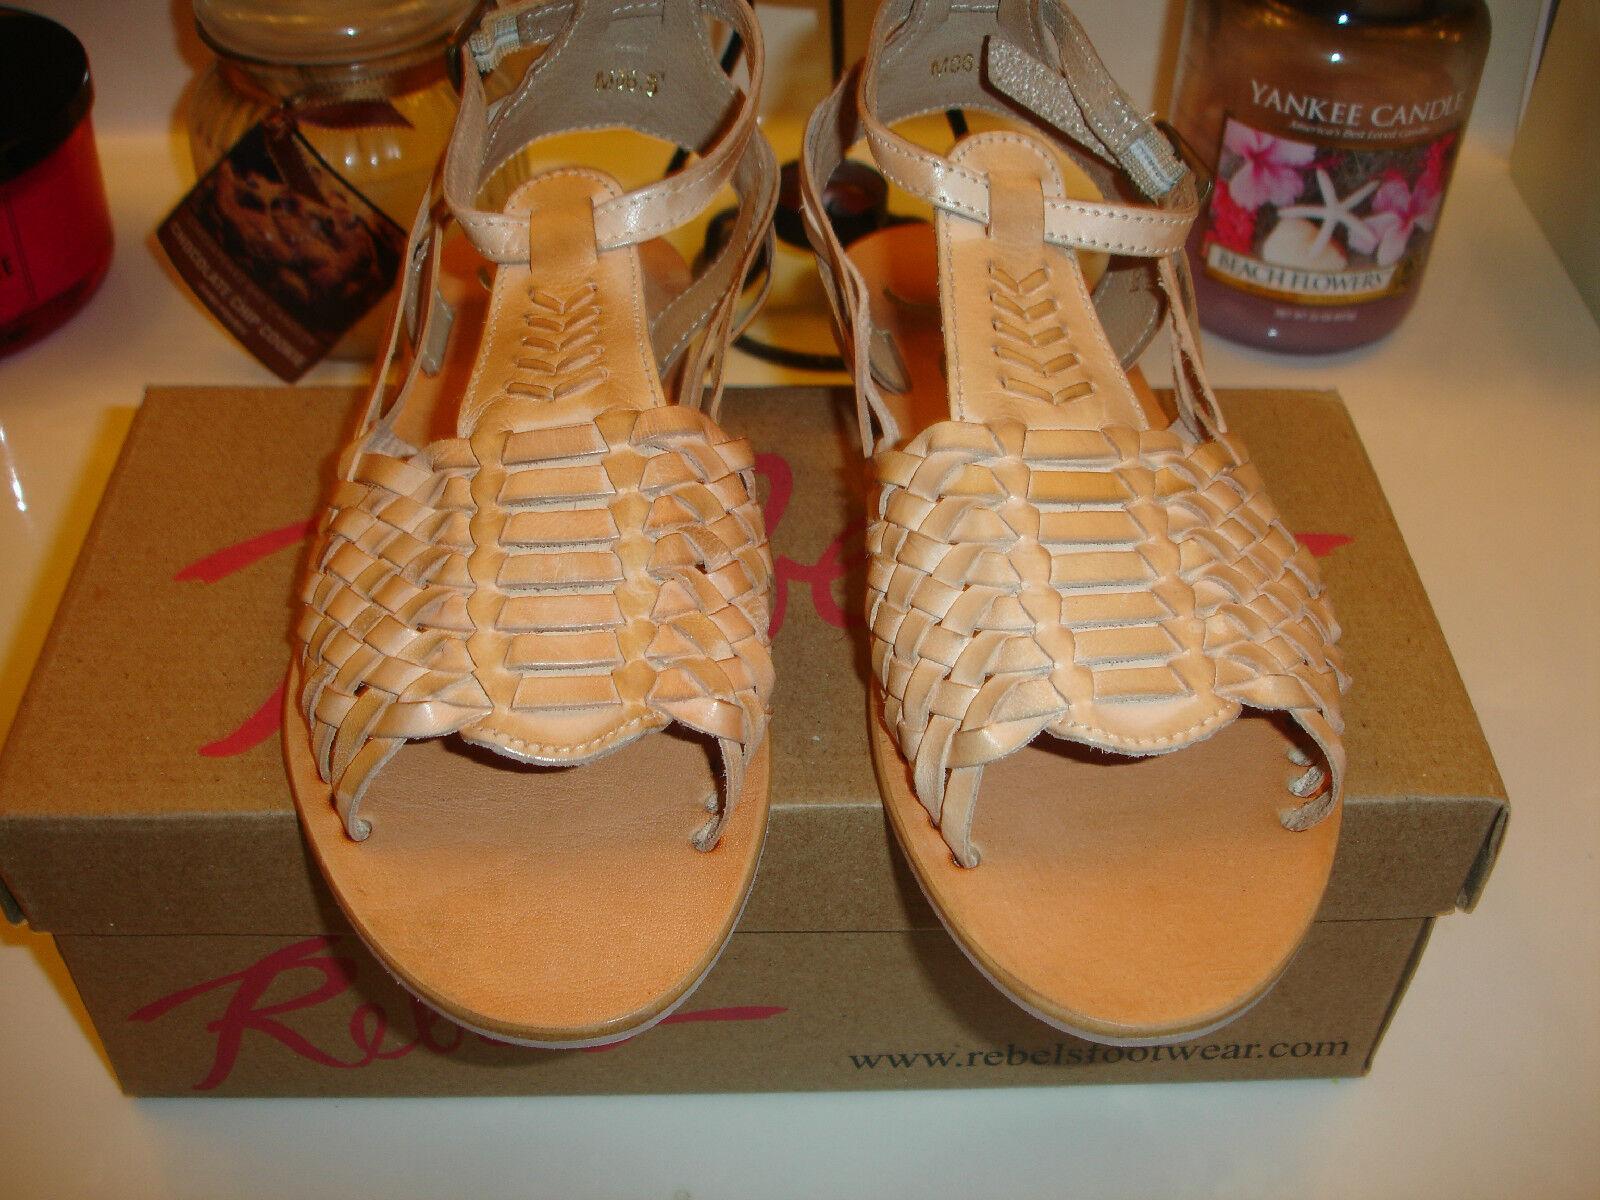 Rebels Nadia2 Natural Tan Leather Sandal Sandal Sandal Comfort  85 6.5 7 7.5 8 8.5 9 10 Nice 7d1152